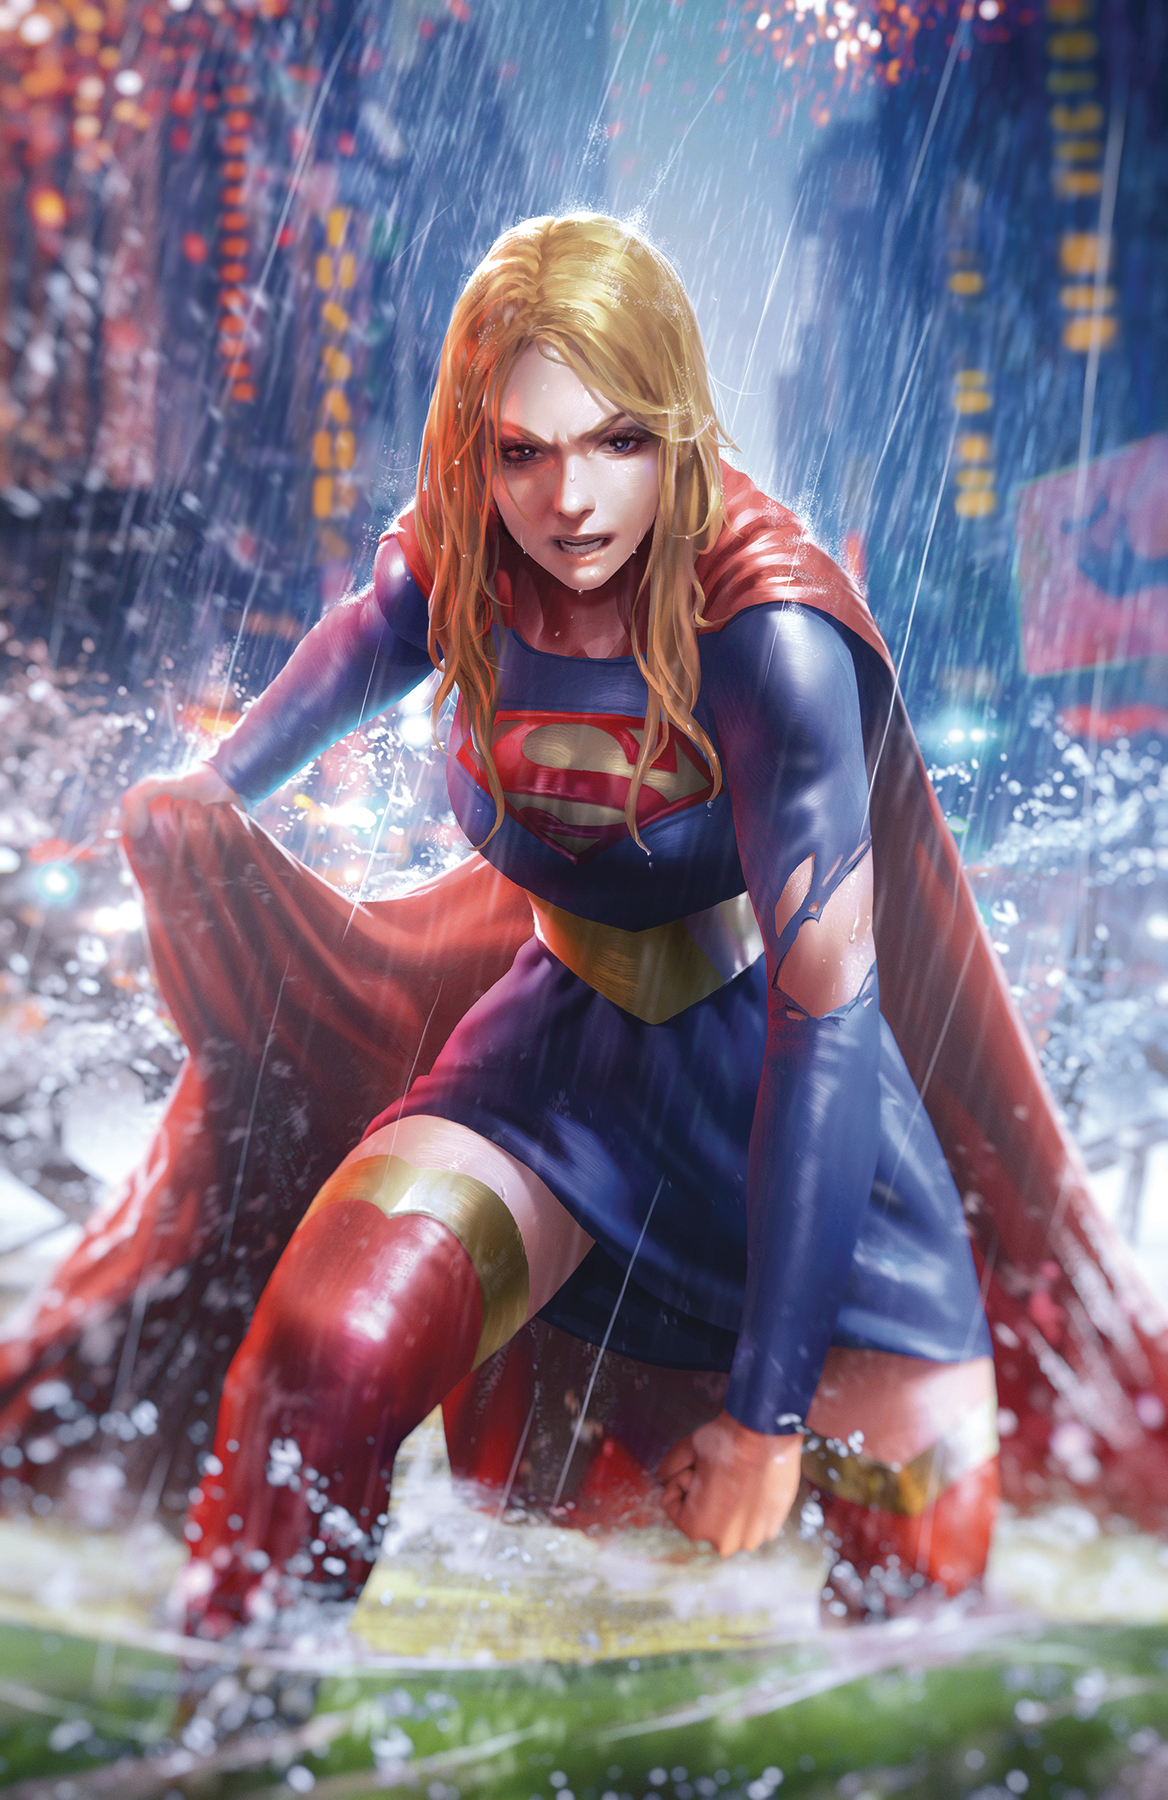 Supergirl Vol 7 39 Textless Variant.jpg